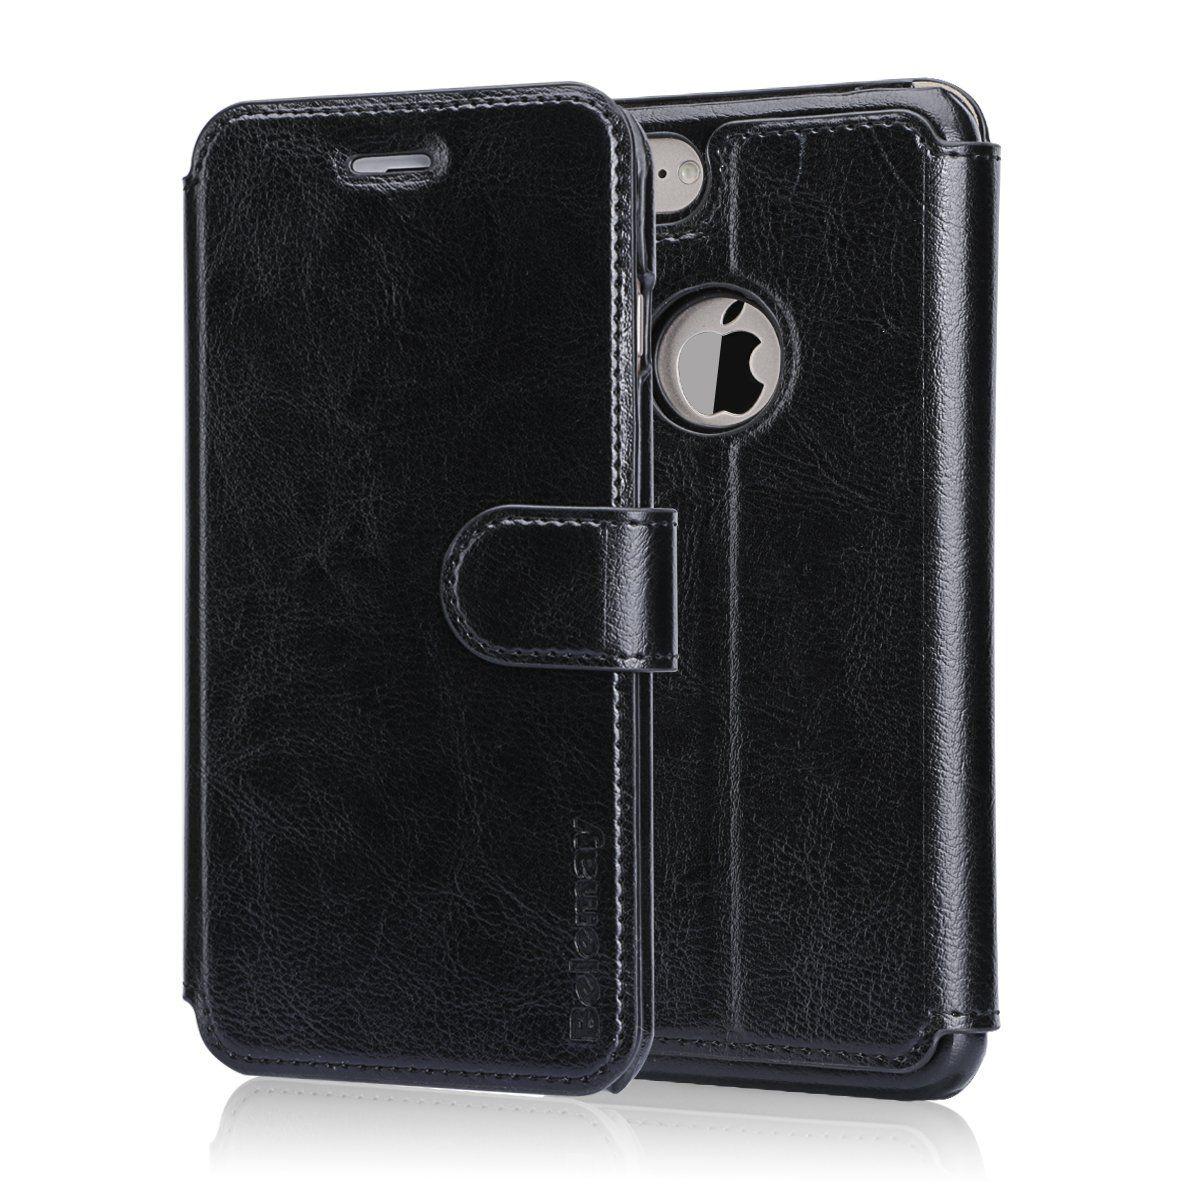 iphone 8 protective flip case